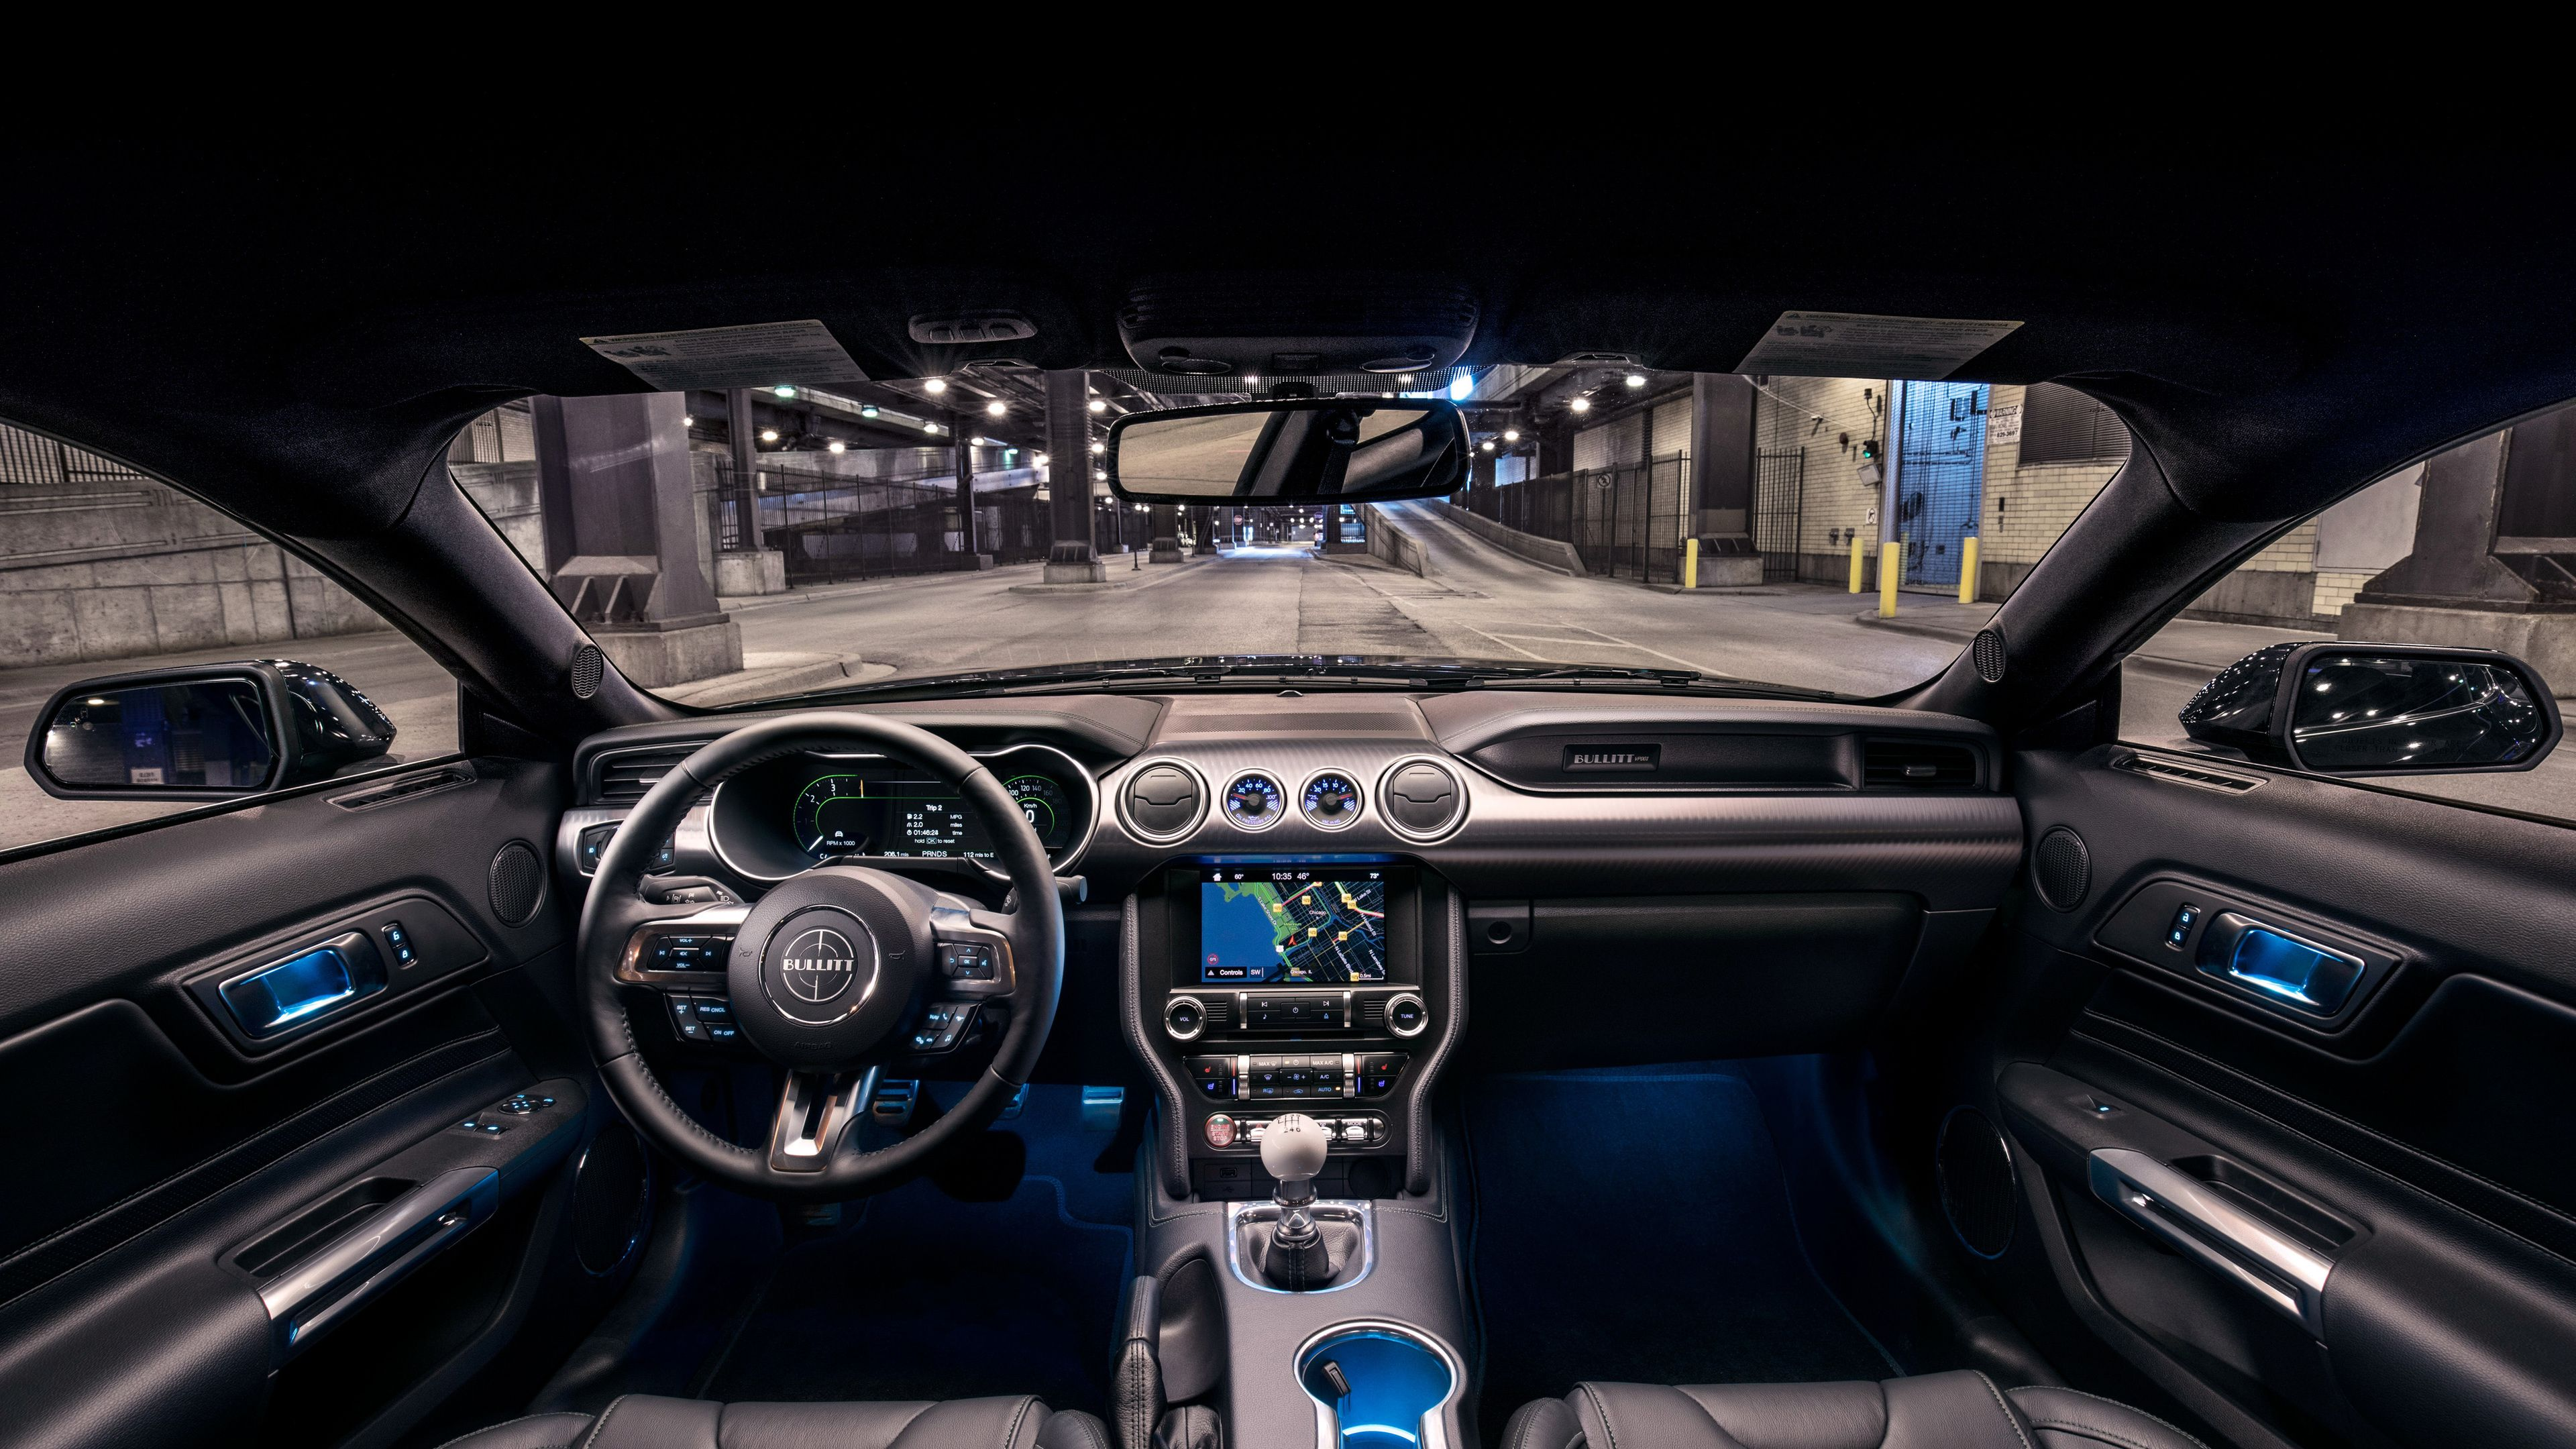 Wallpaper 4k Ford Mustang Bullitt Interior 2019 Cars Wallpapers